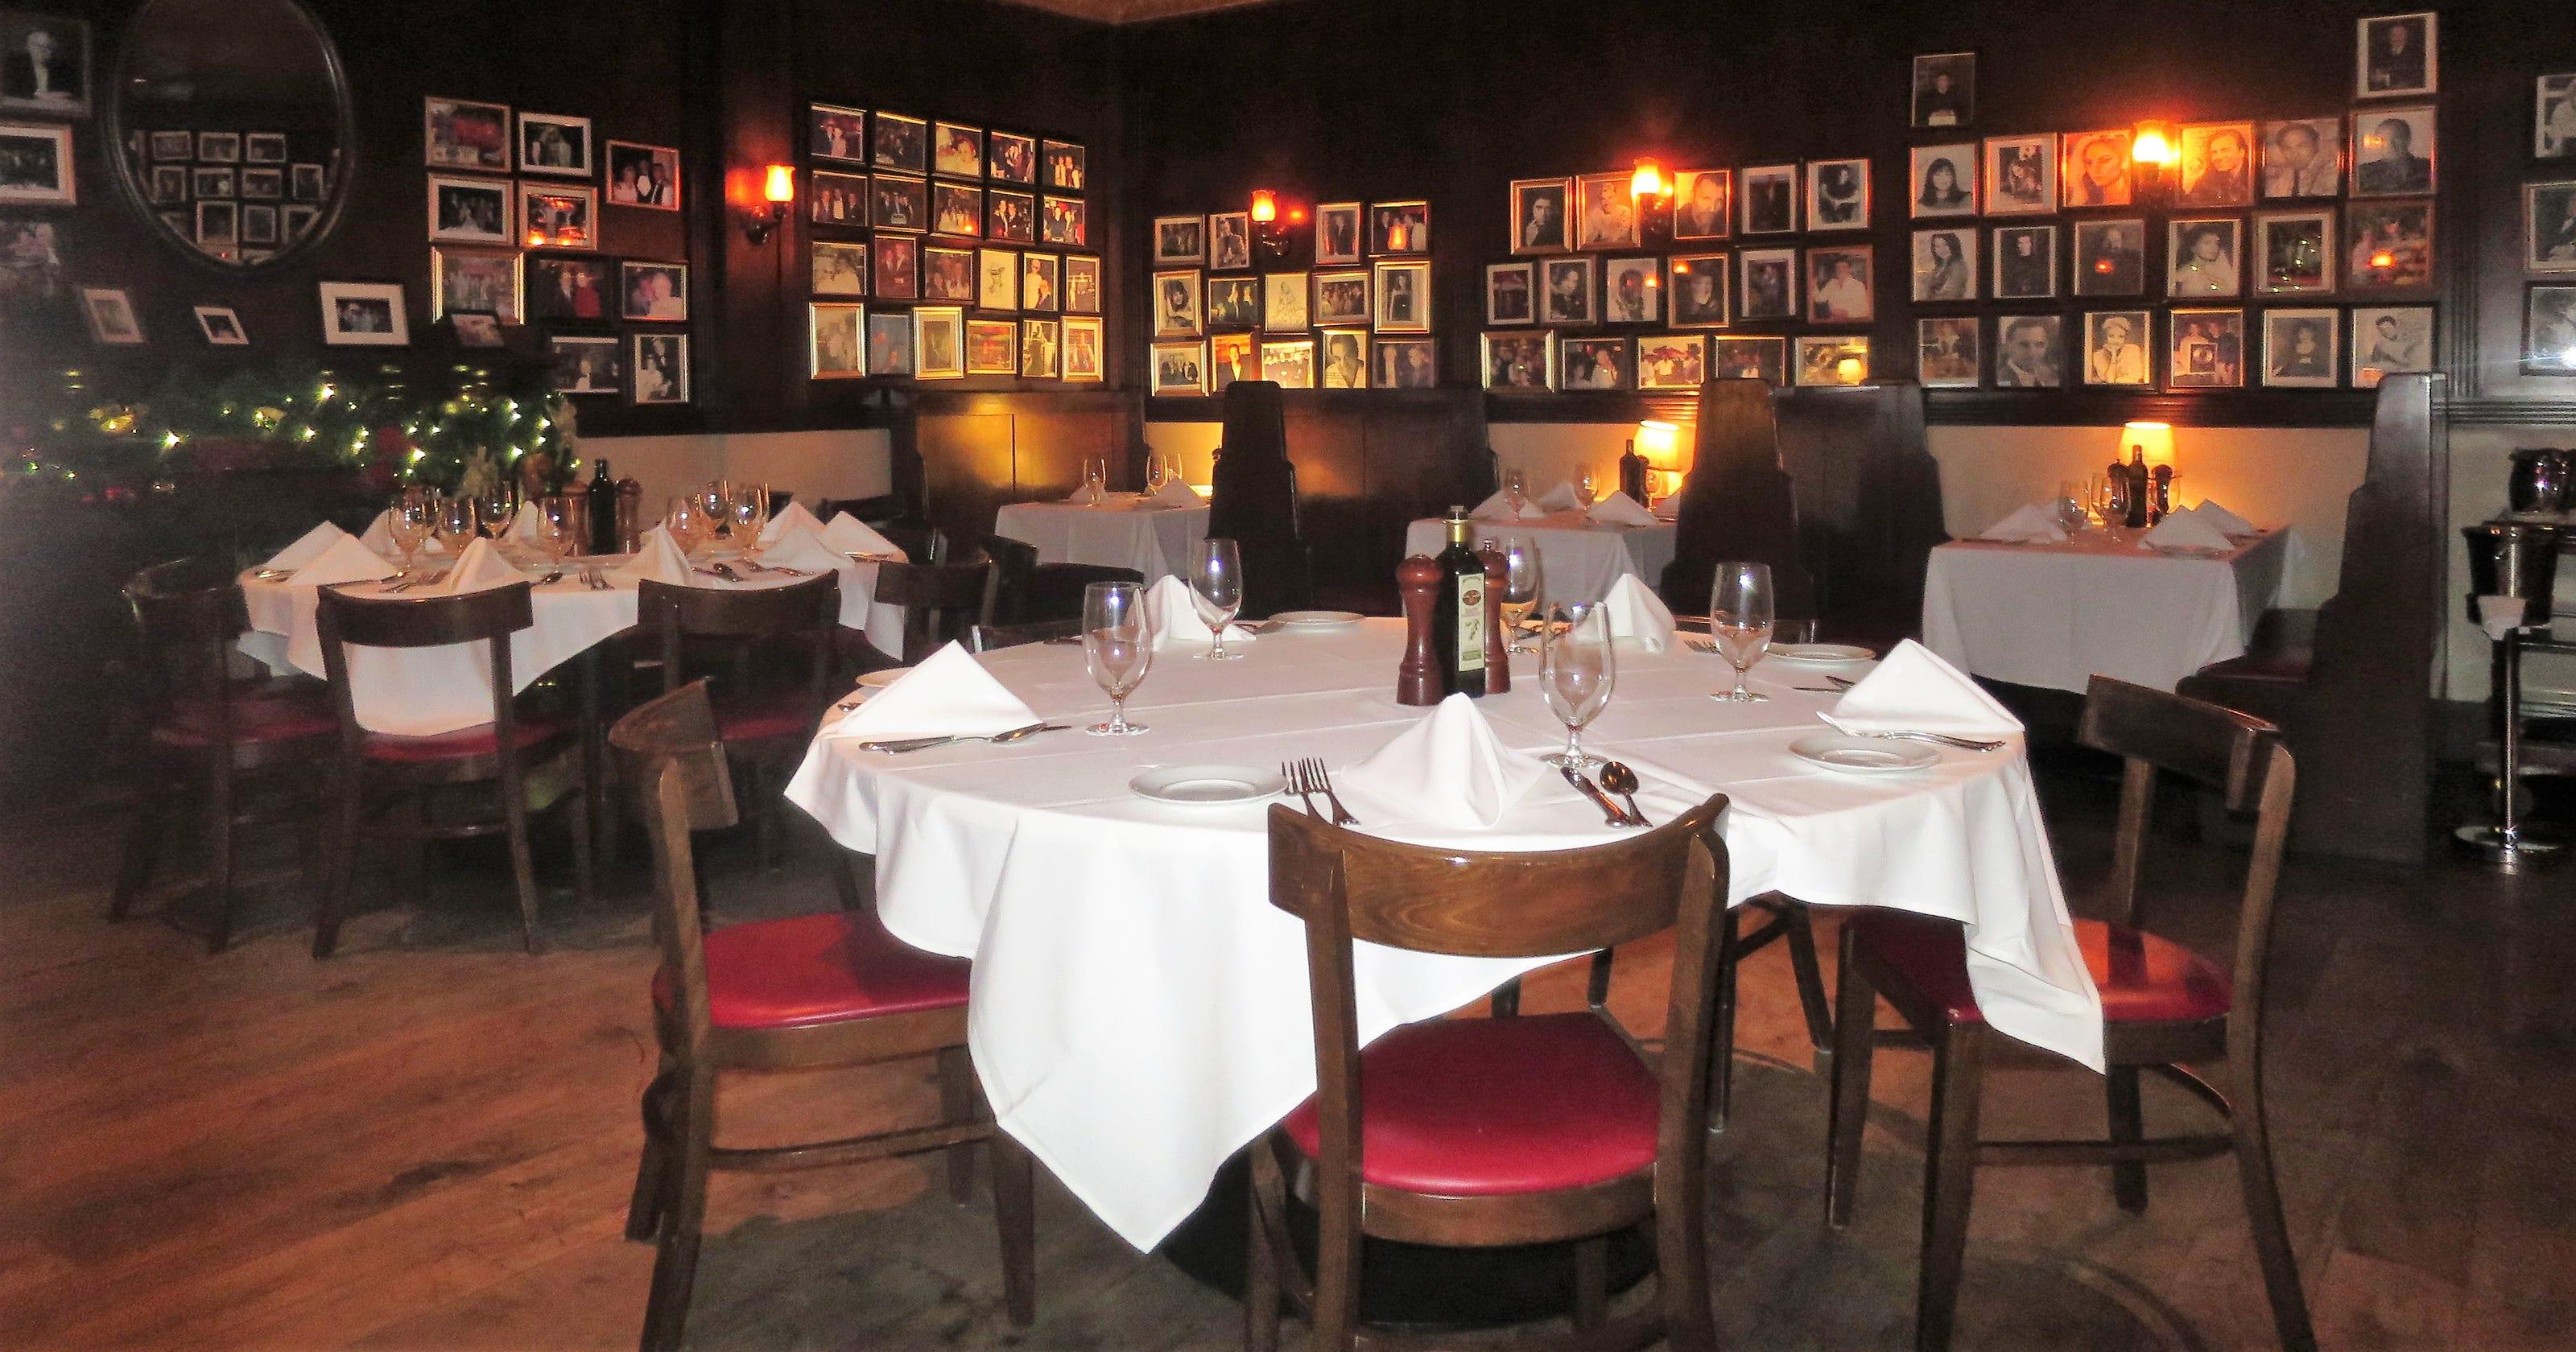 Rao S Restaurant In New York City Los Angeles And Las Vegas